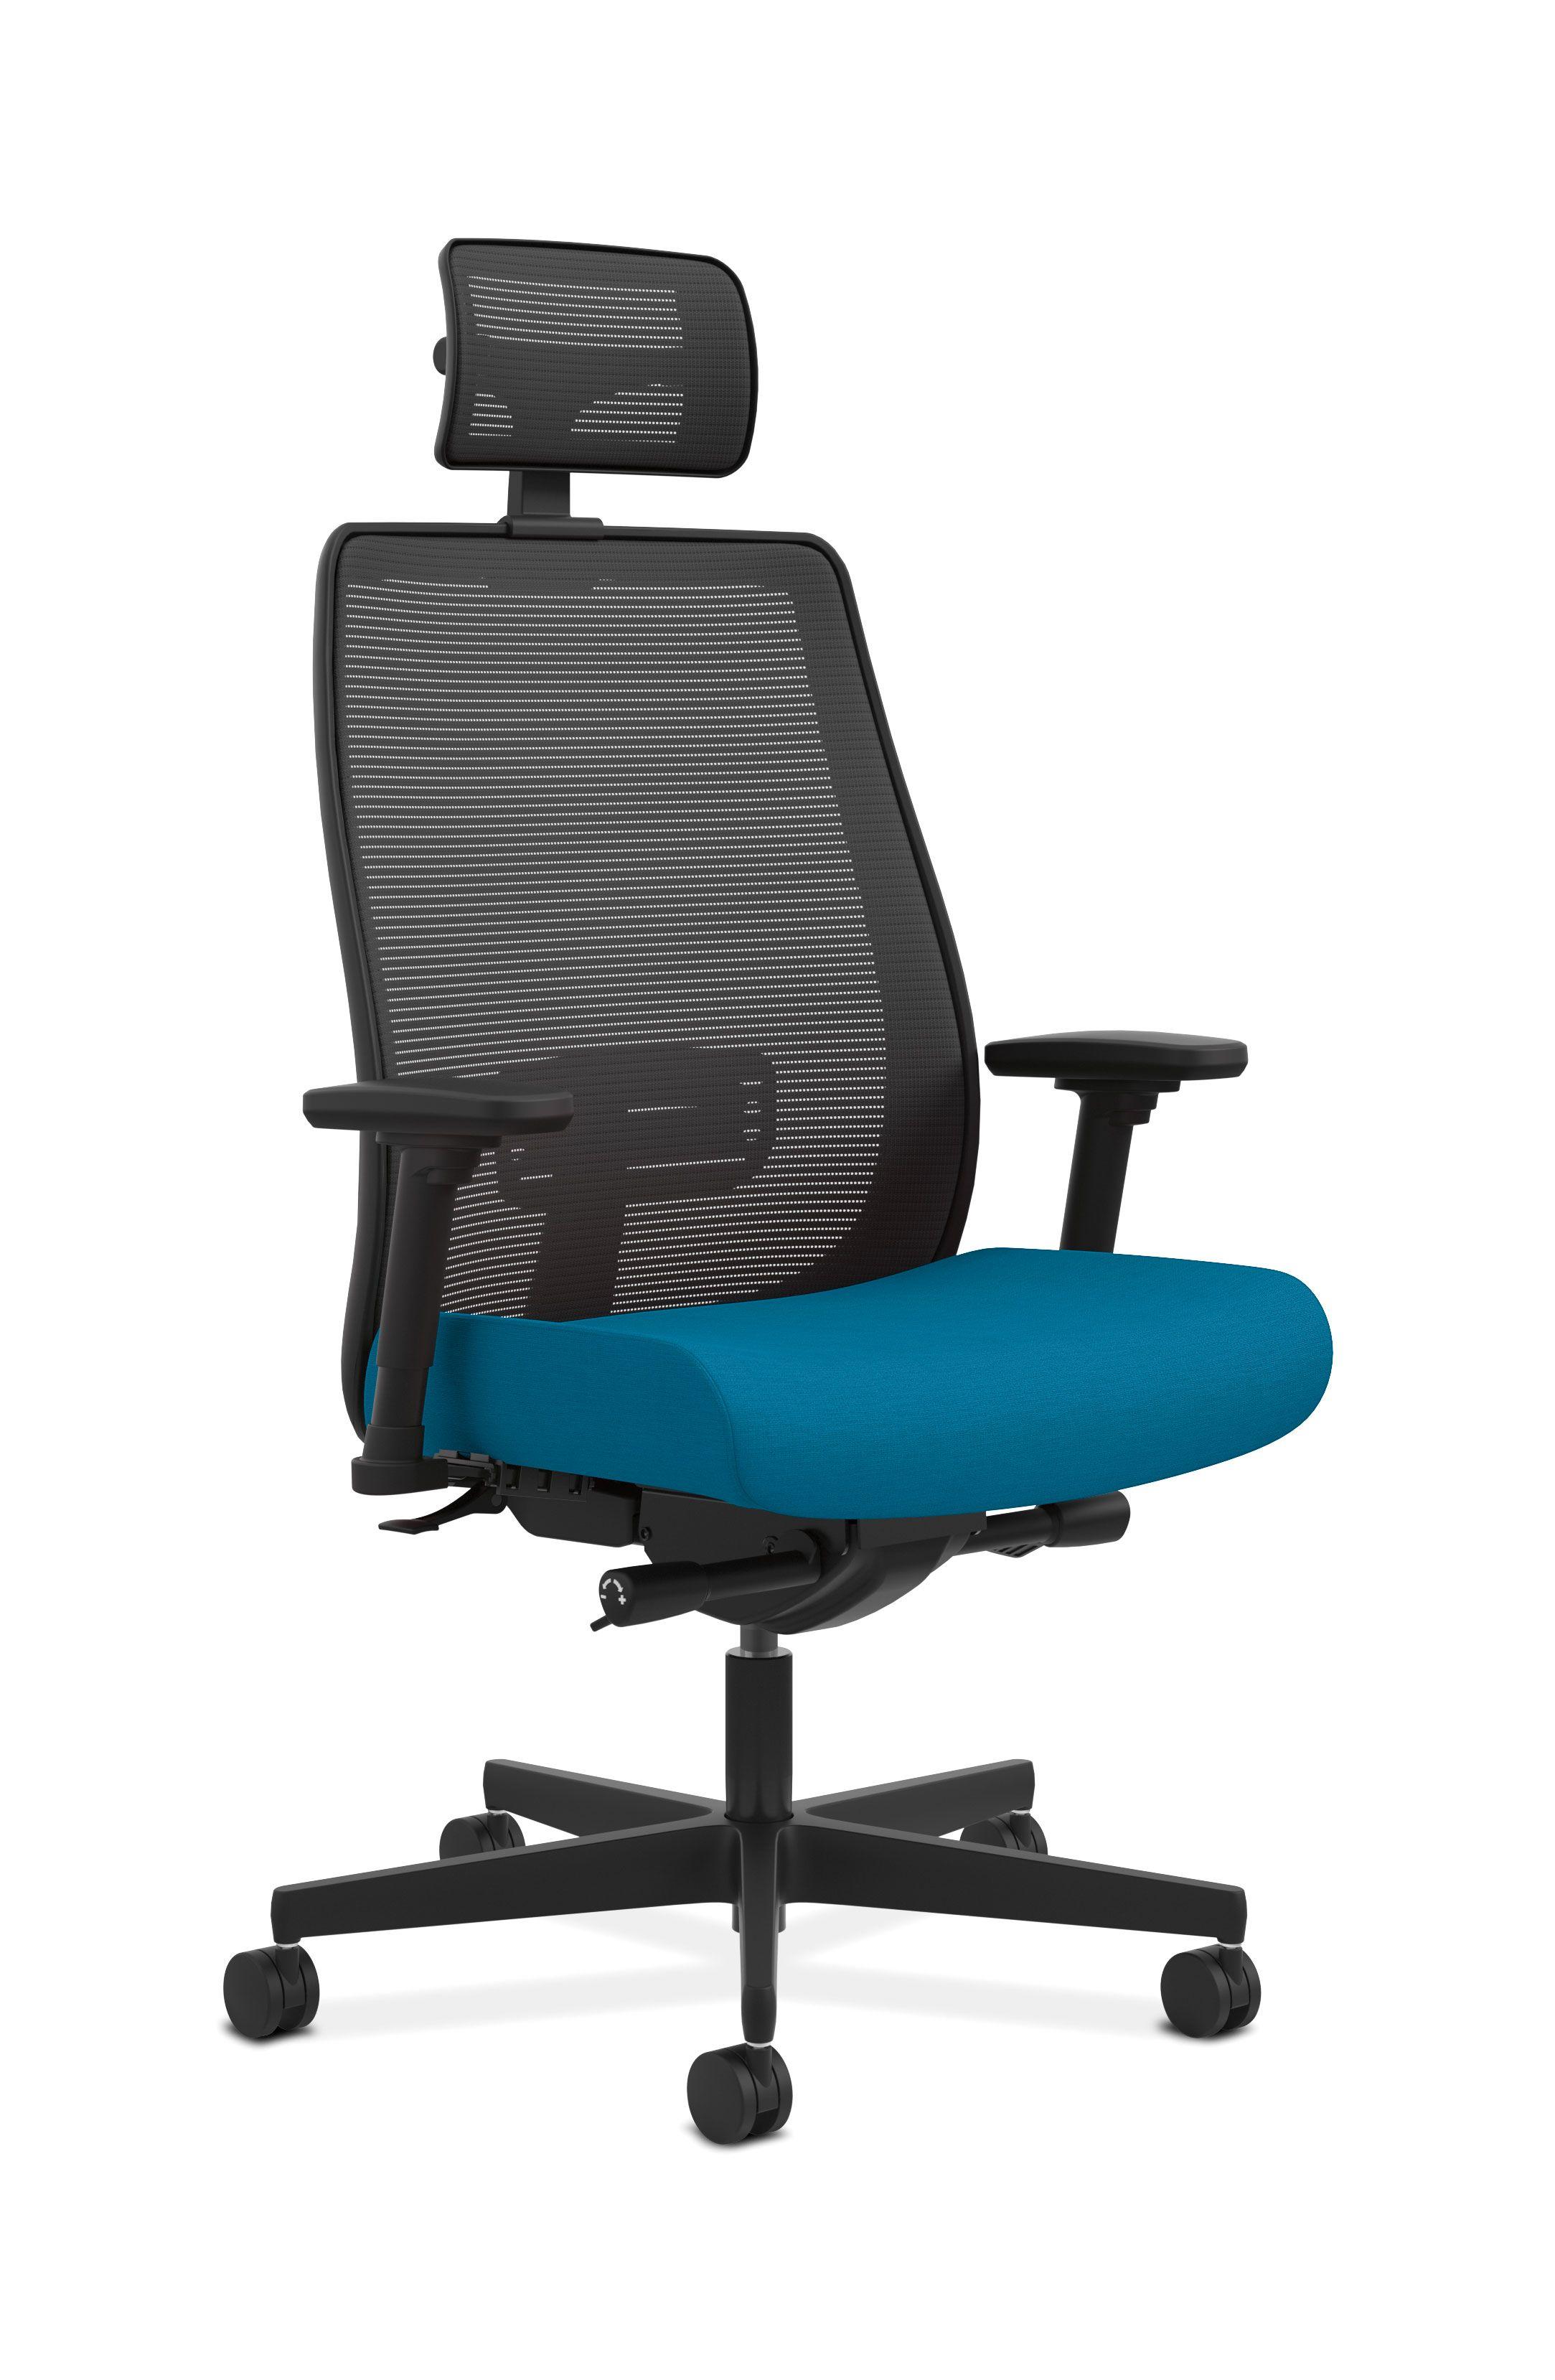 Peachy Endorse Mid Back Mesh Task Chair With Headrest Advanced Bralicious Painted Fabric Chair Ideas Braliciousco